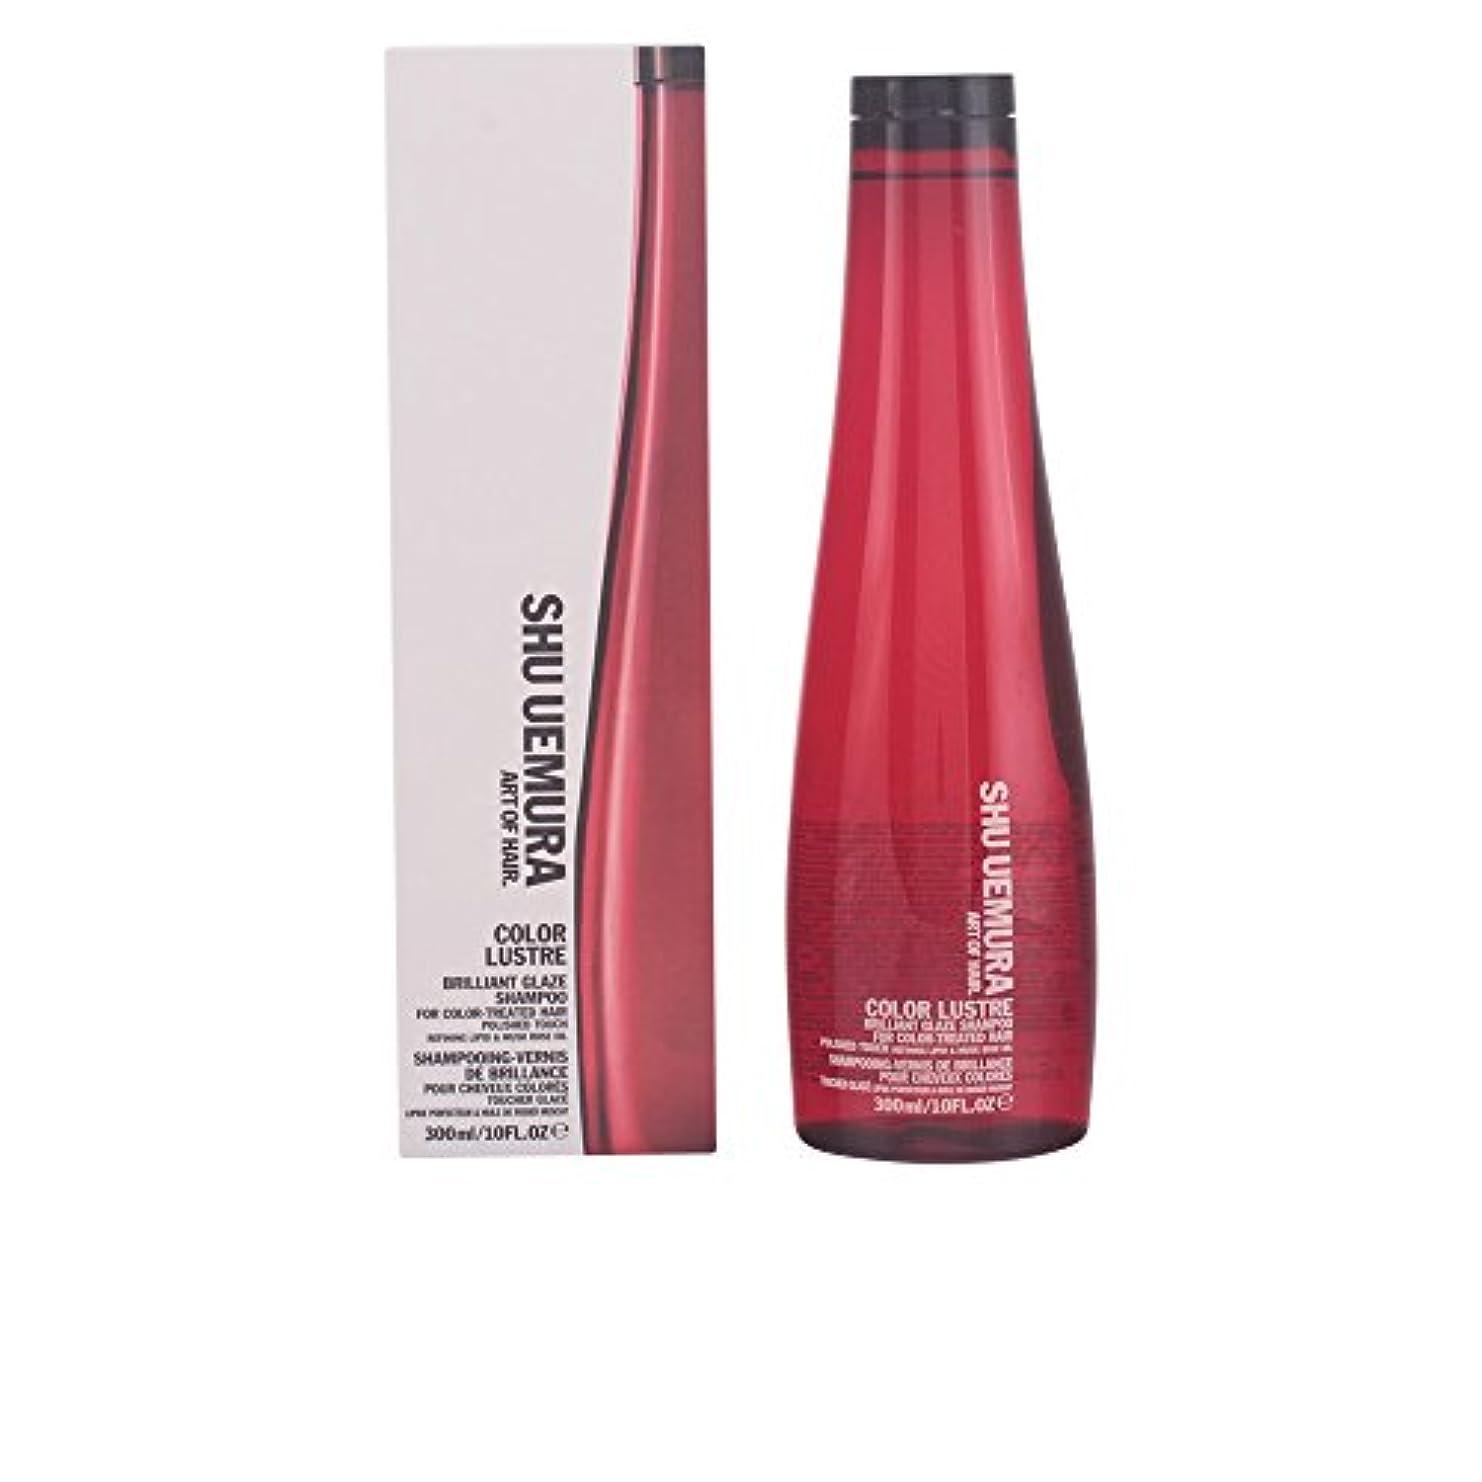 Color Lustre Sulfate-Free Brilliant Glaze Shampoo (For Color-Treated Hair)[並行輸入品]